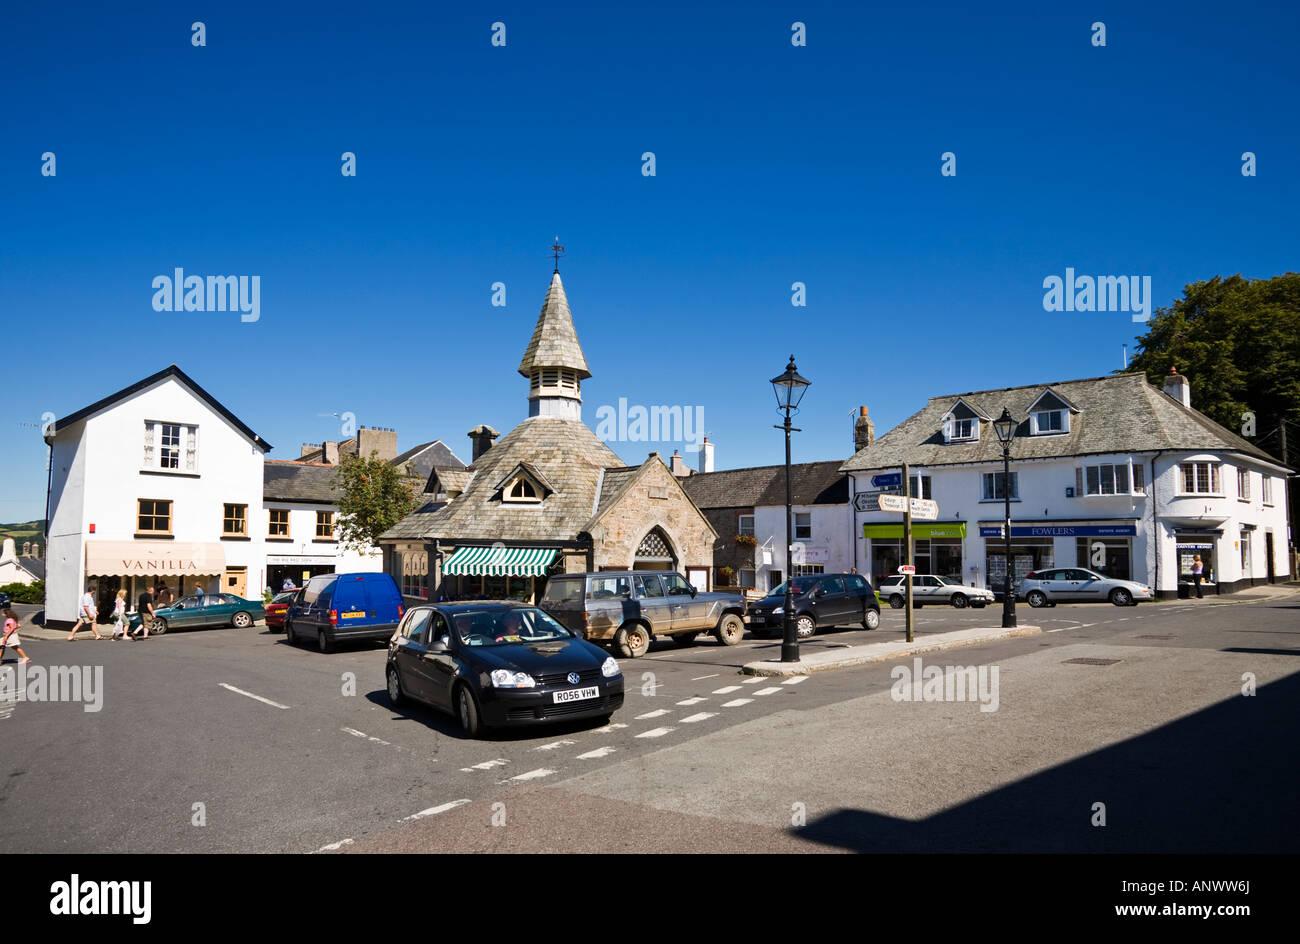 Village centre in Chagford, West Devon, England, UK - Stock Image